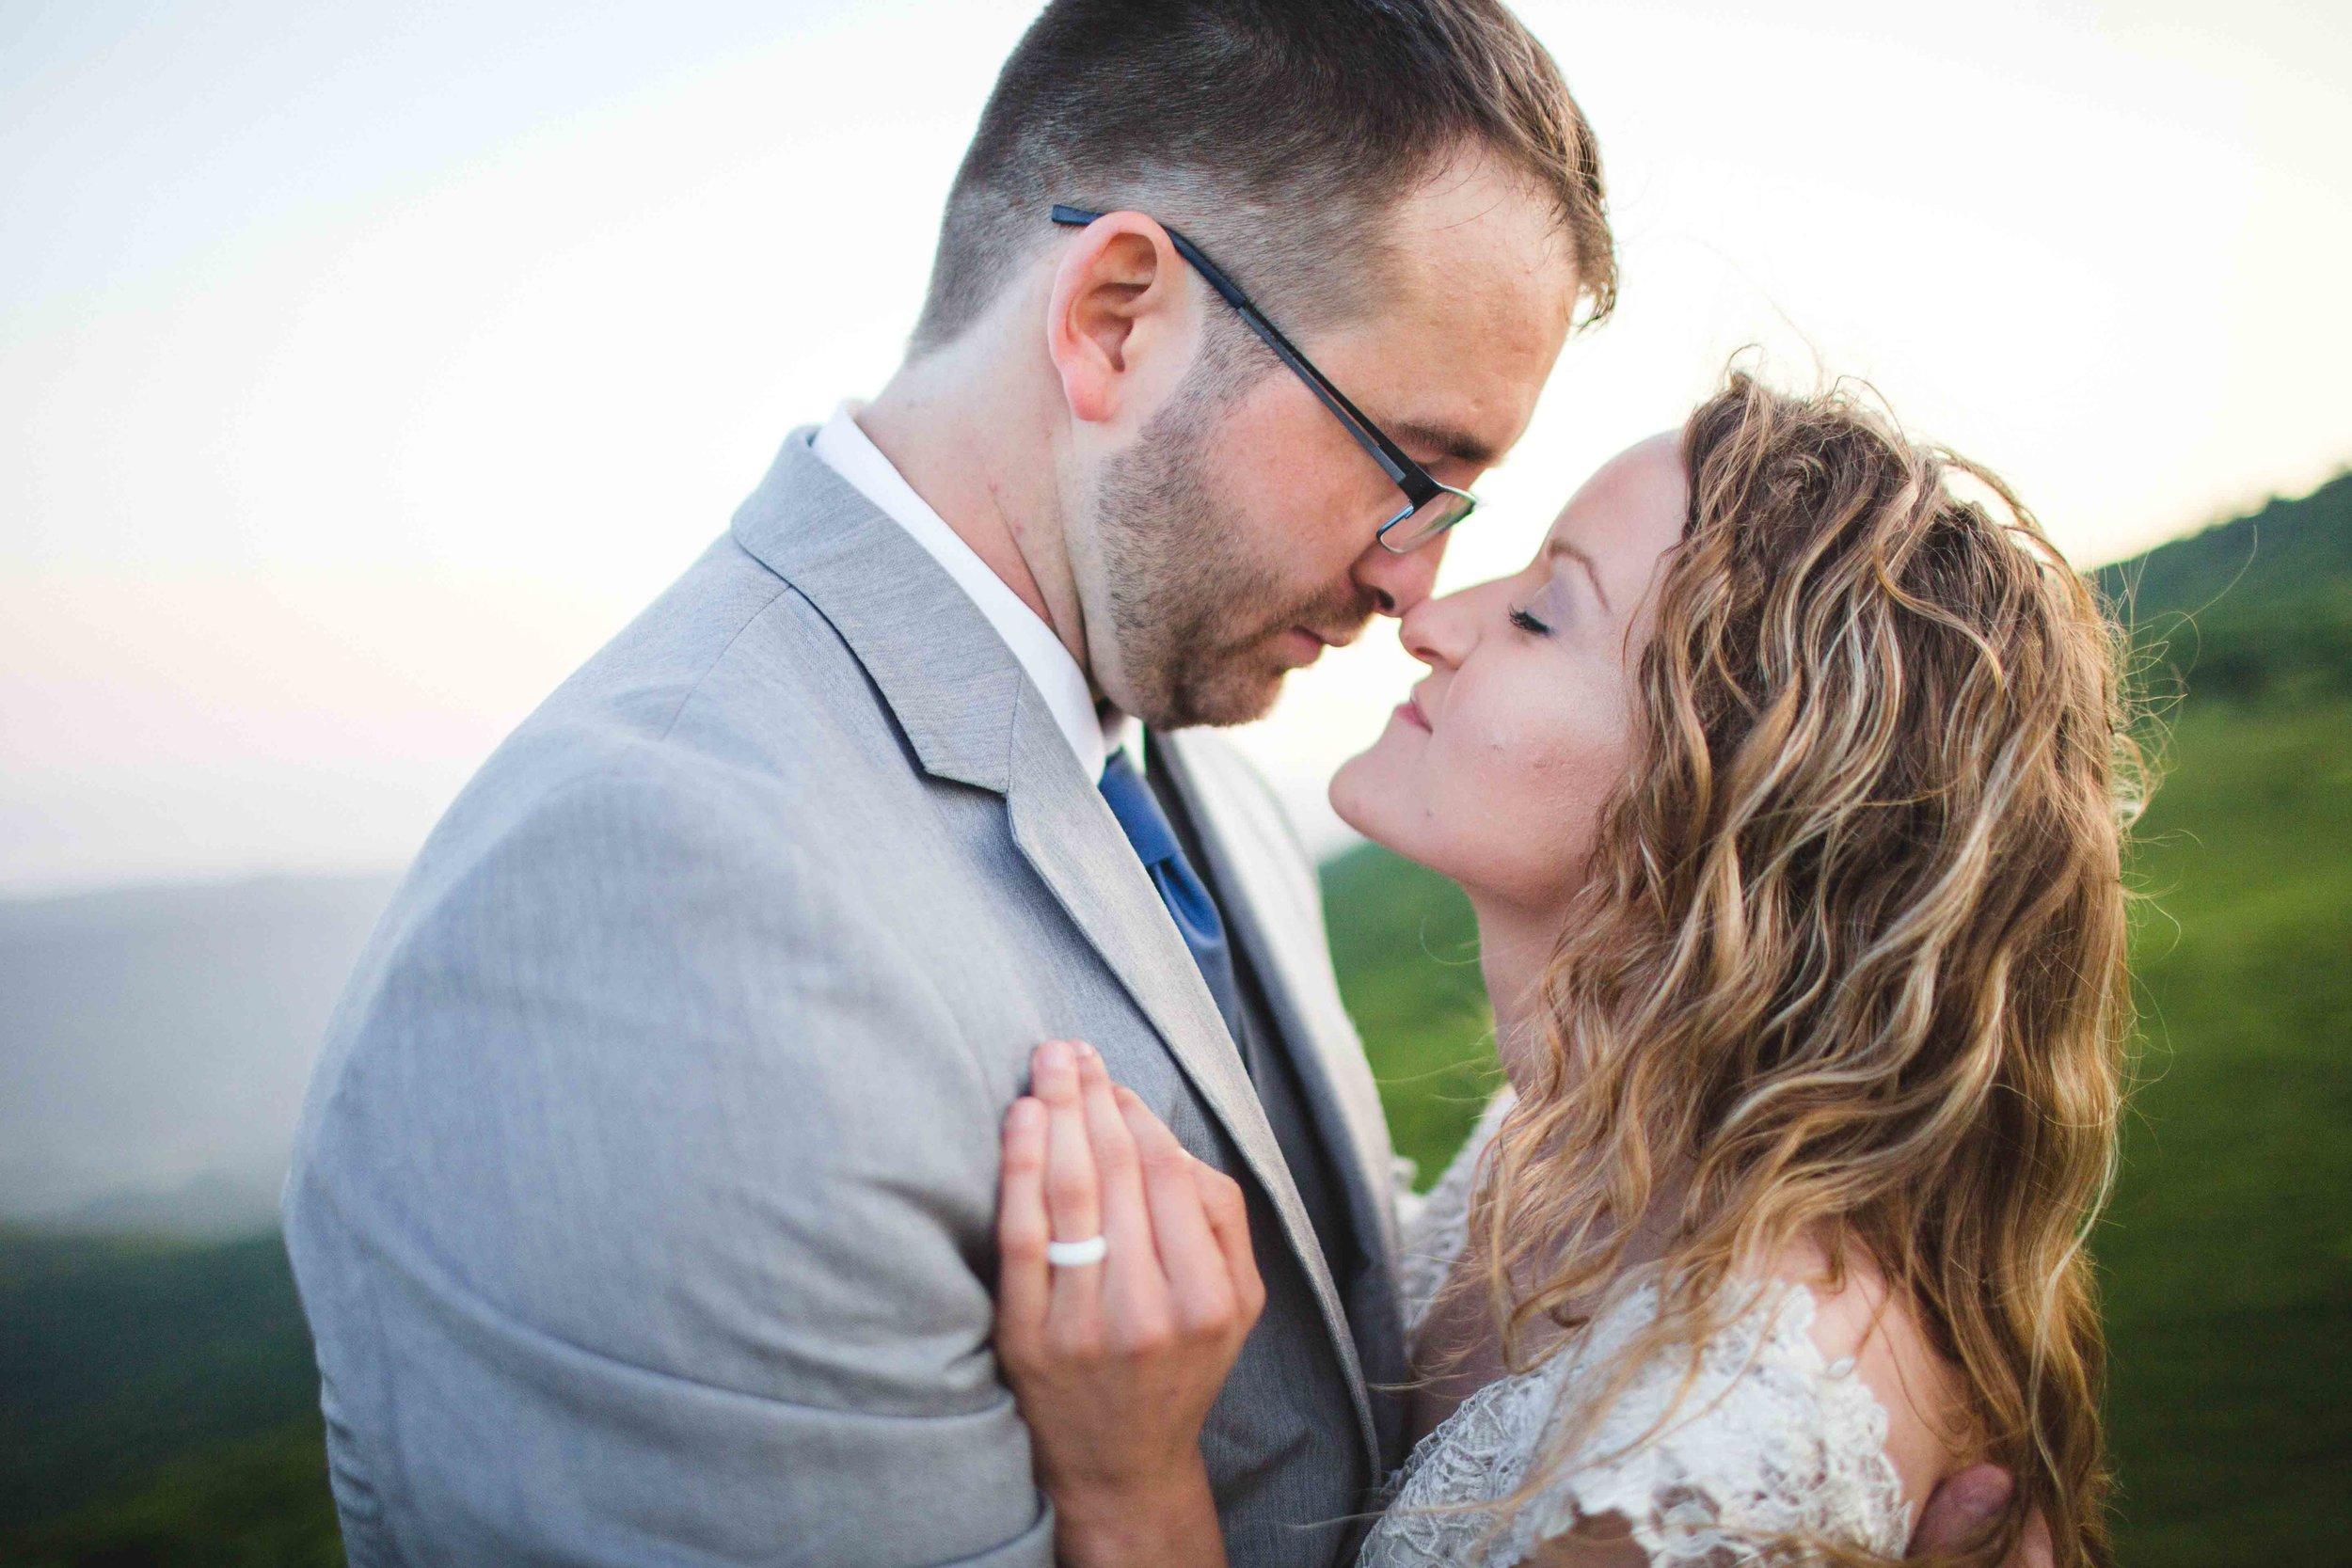 north-carolina-elopement-photographer-55.jpg